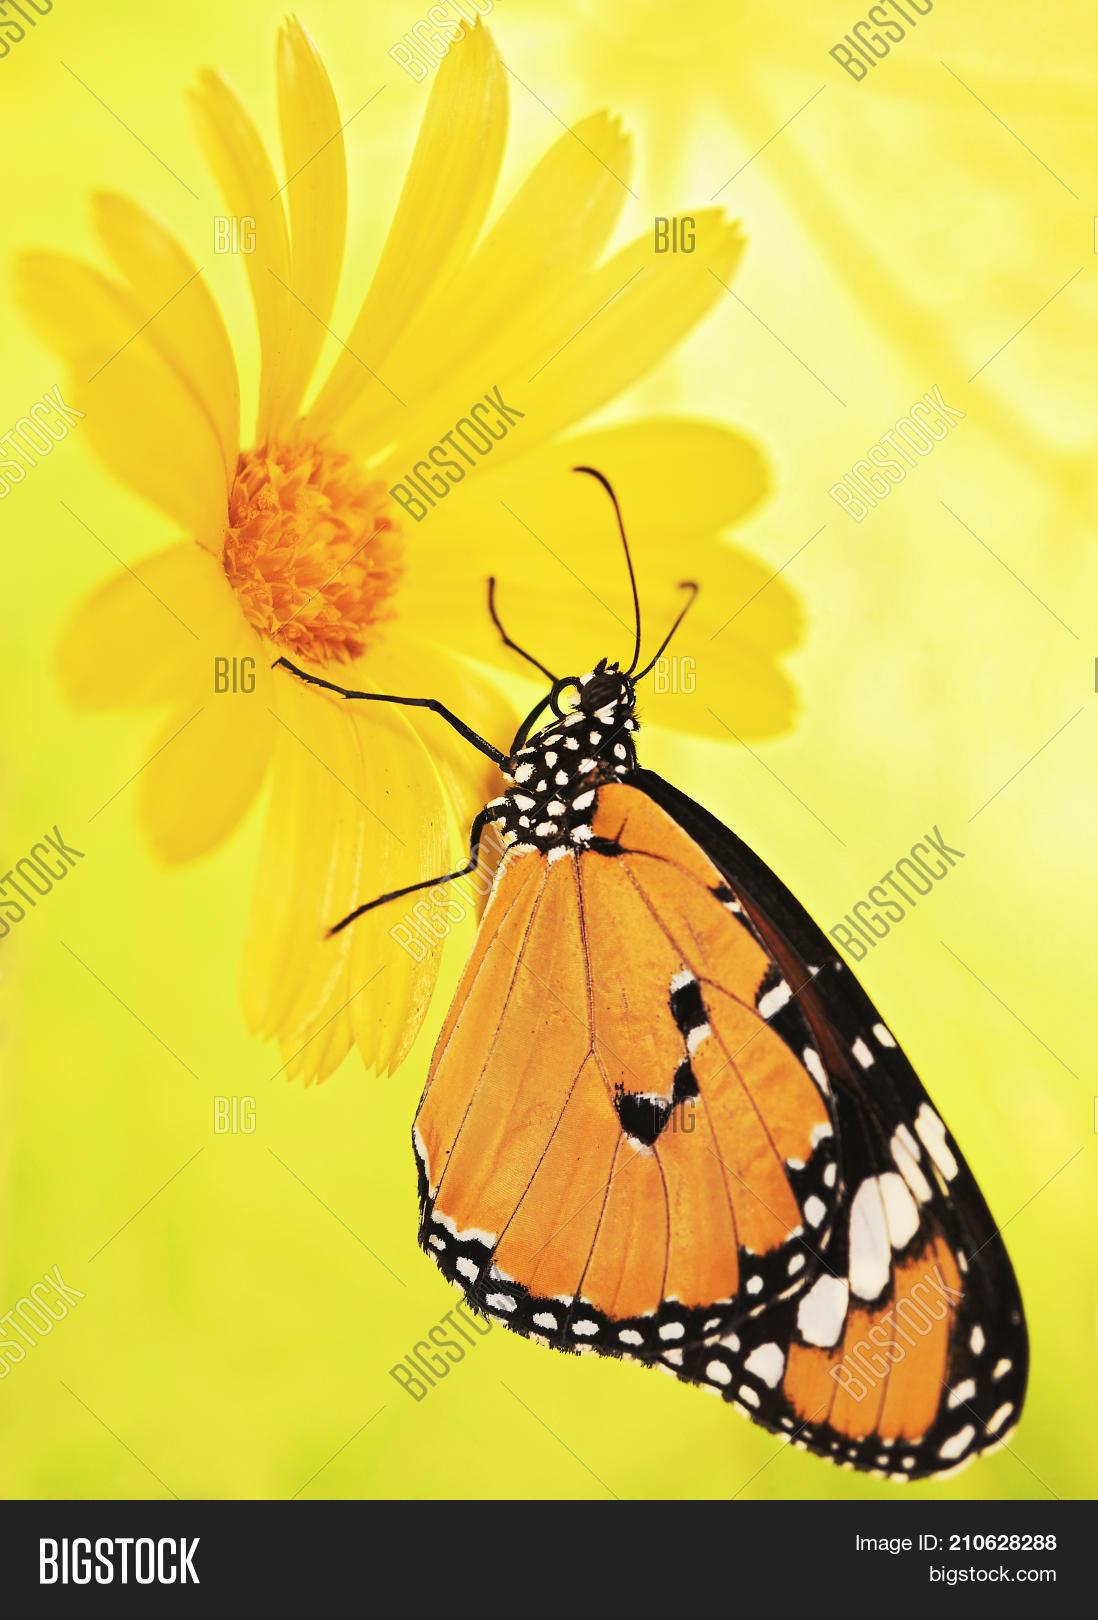 Philippines,abdomen,animal,beautiful,beauty,blur,bokeh,bug,butterfly,calendula,chrysippus,close-up,closeup,danaus,entomology,feed,flower,gradient,insect,lepidoptera,life,macro,marigold,monarch,moth,nature,nectar,orange,ornament,pattern,petal,proboscis,rhombus,tropical,widespread,wing,yellow